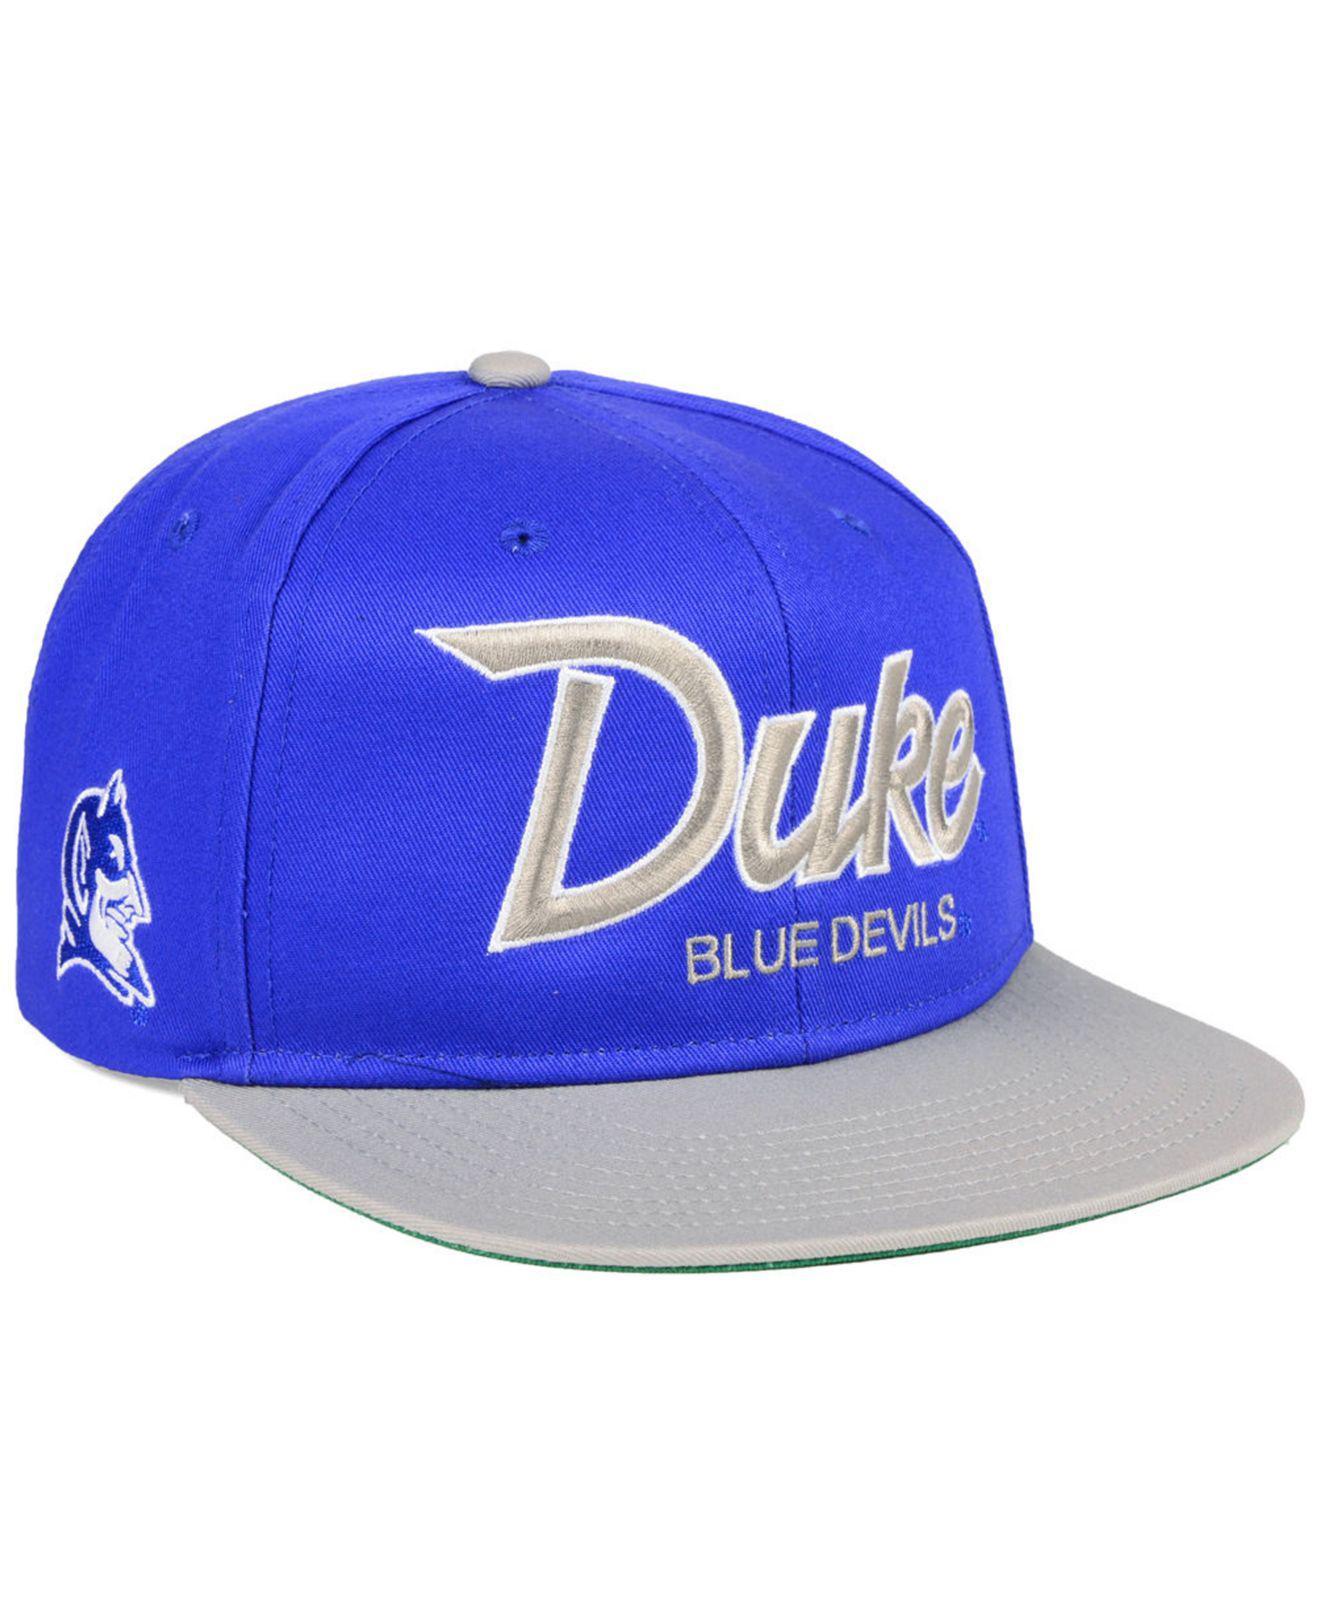 quality design dbdf5 5ee32 ... where can i buy lyst nike duke blue devils sport specialties snapback  cap in blue e0b72